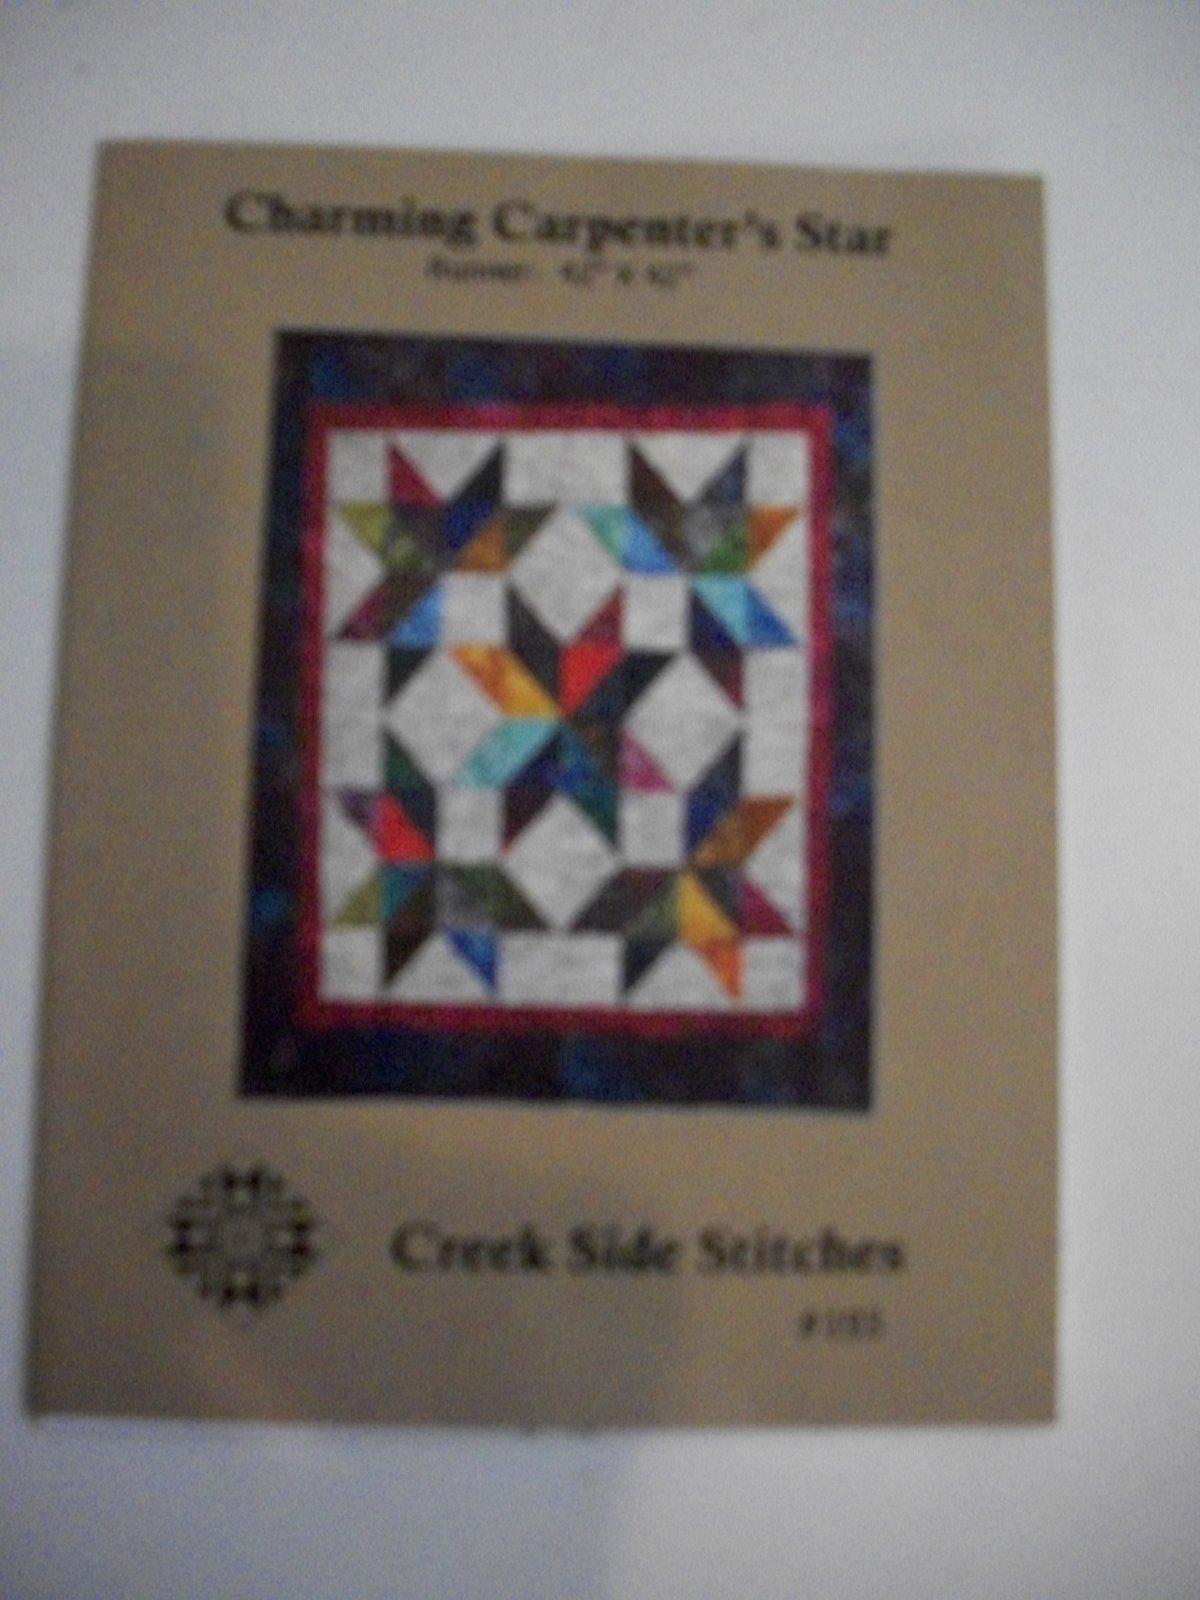 Charming Carpenter's Star